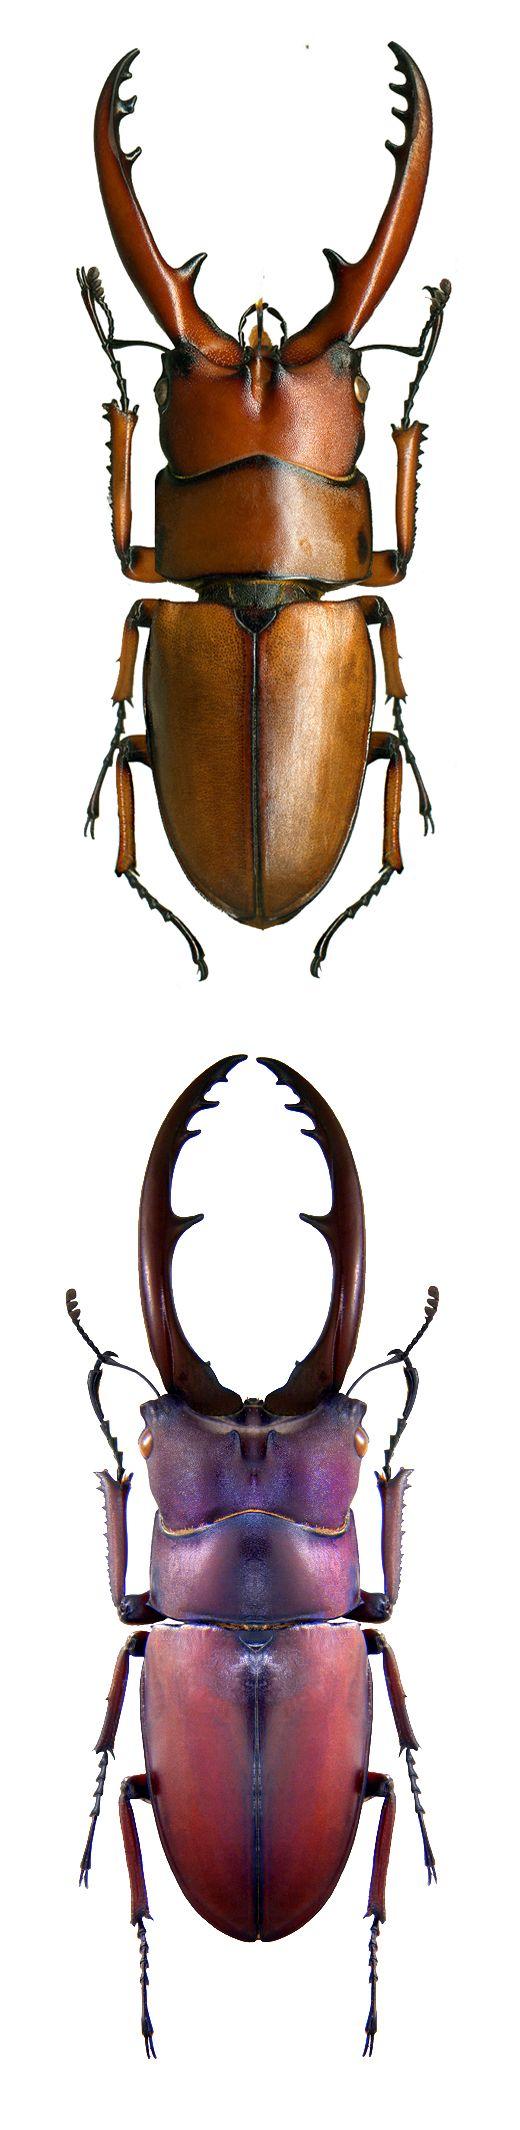 Prosocopoilus astacoides; Prosopocoilus astacoides castaneus